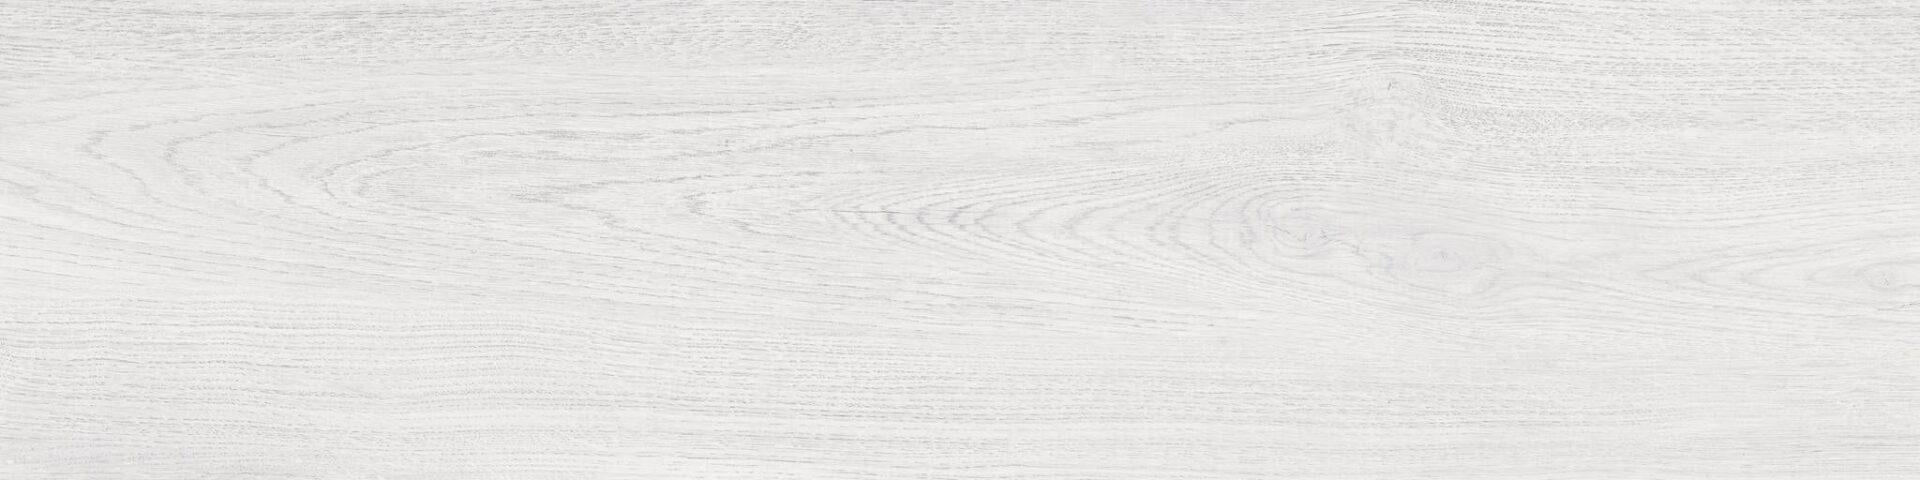 BAVARO GLACIAR Granite Alba Premium Natural Stones Countertops